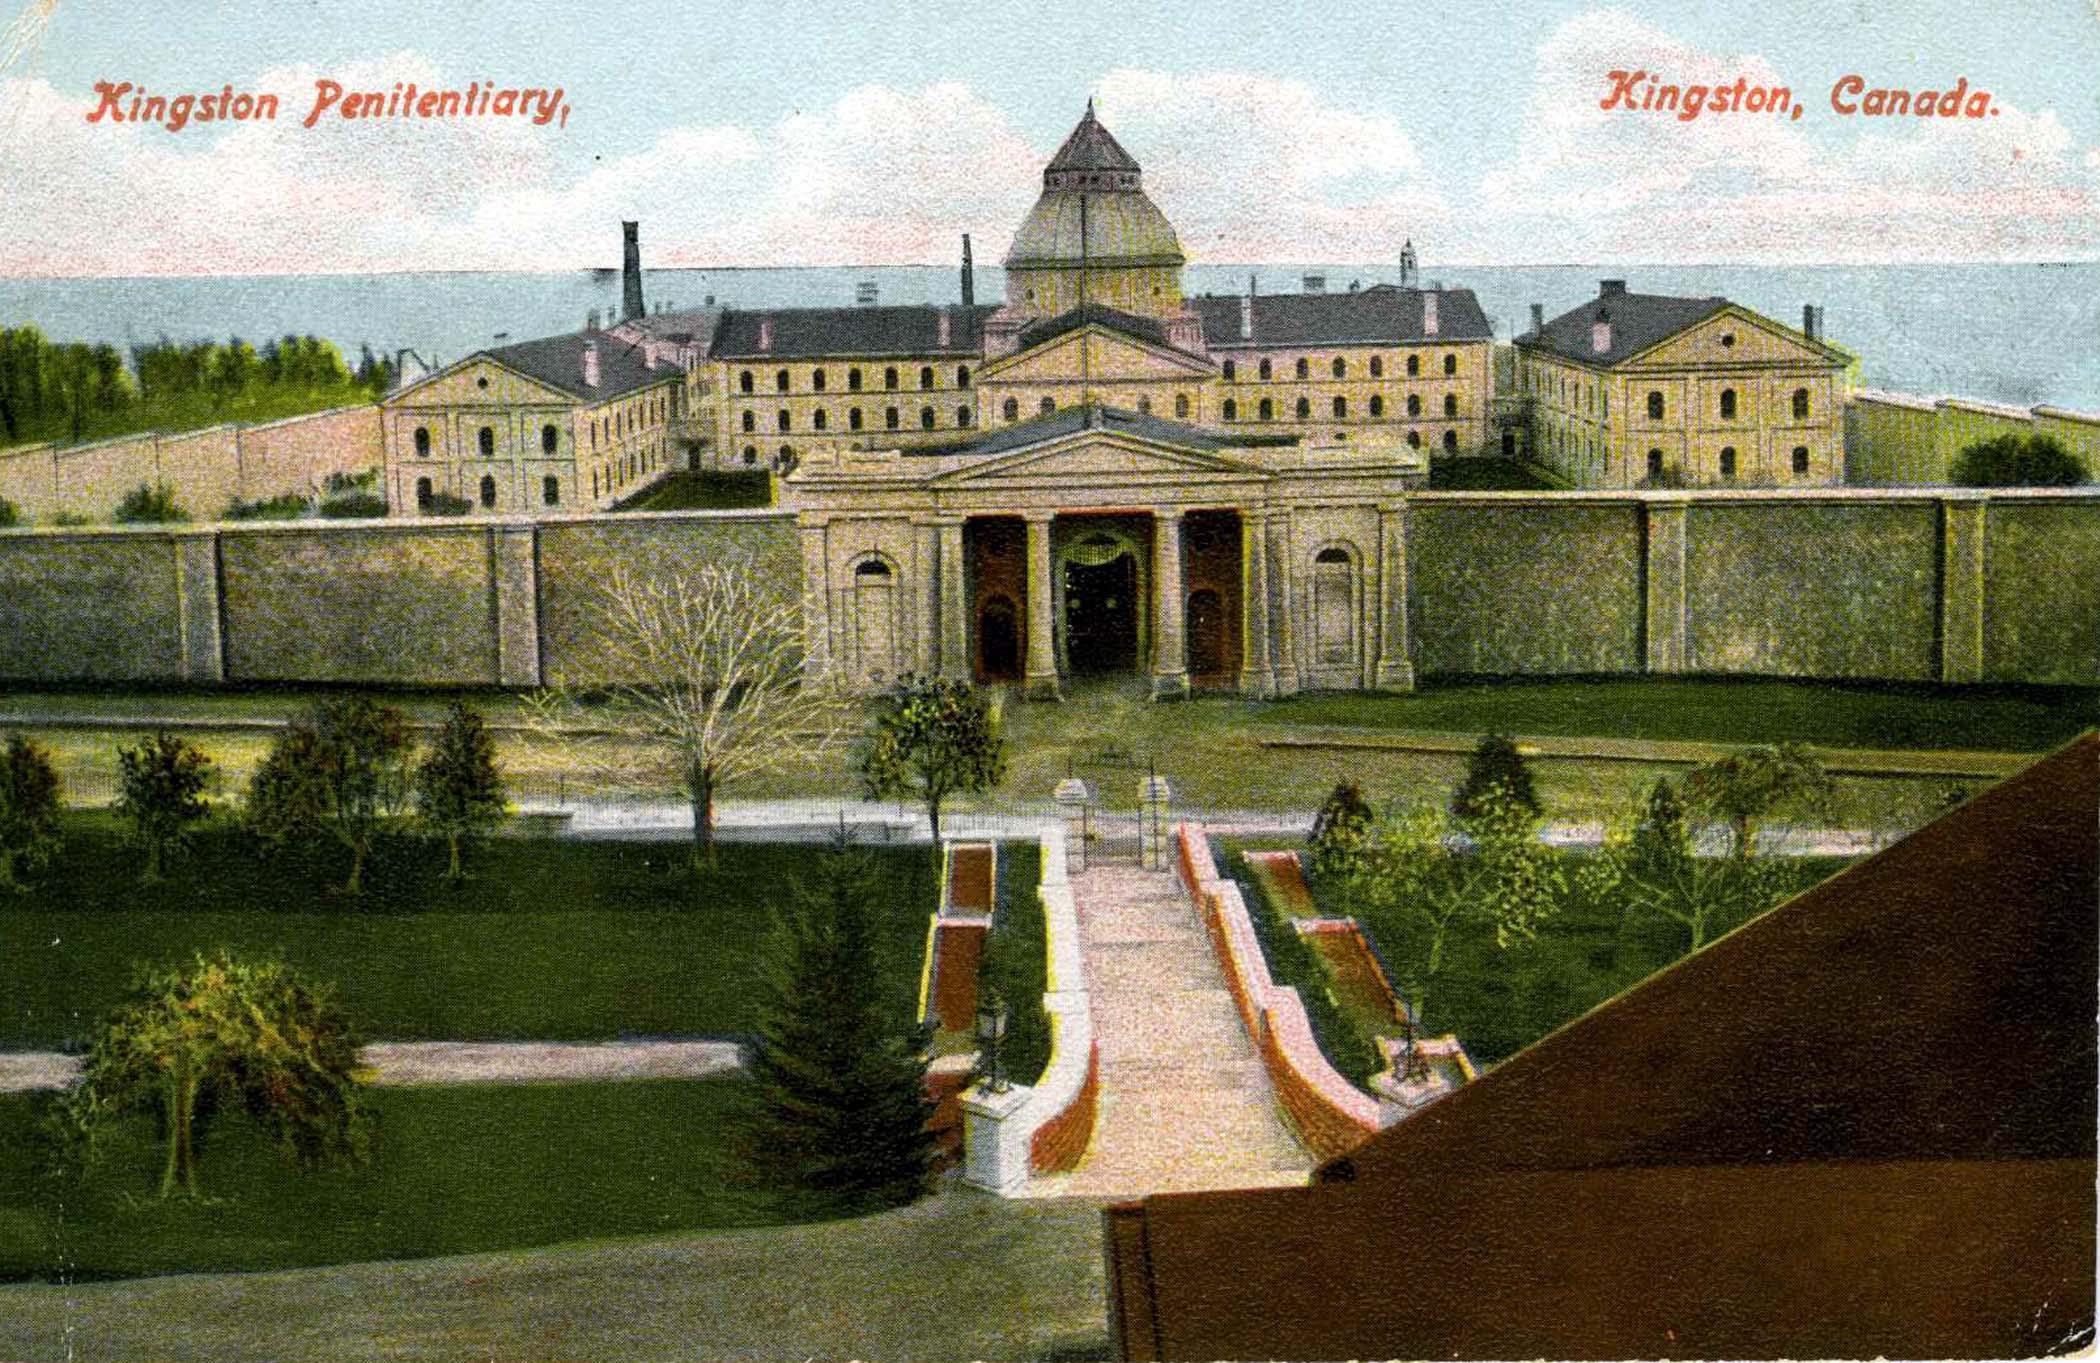 Postcard of Kingston Penitentiary, 1905